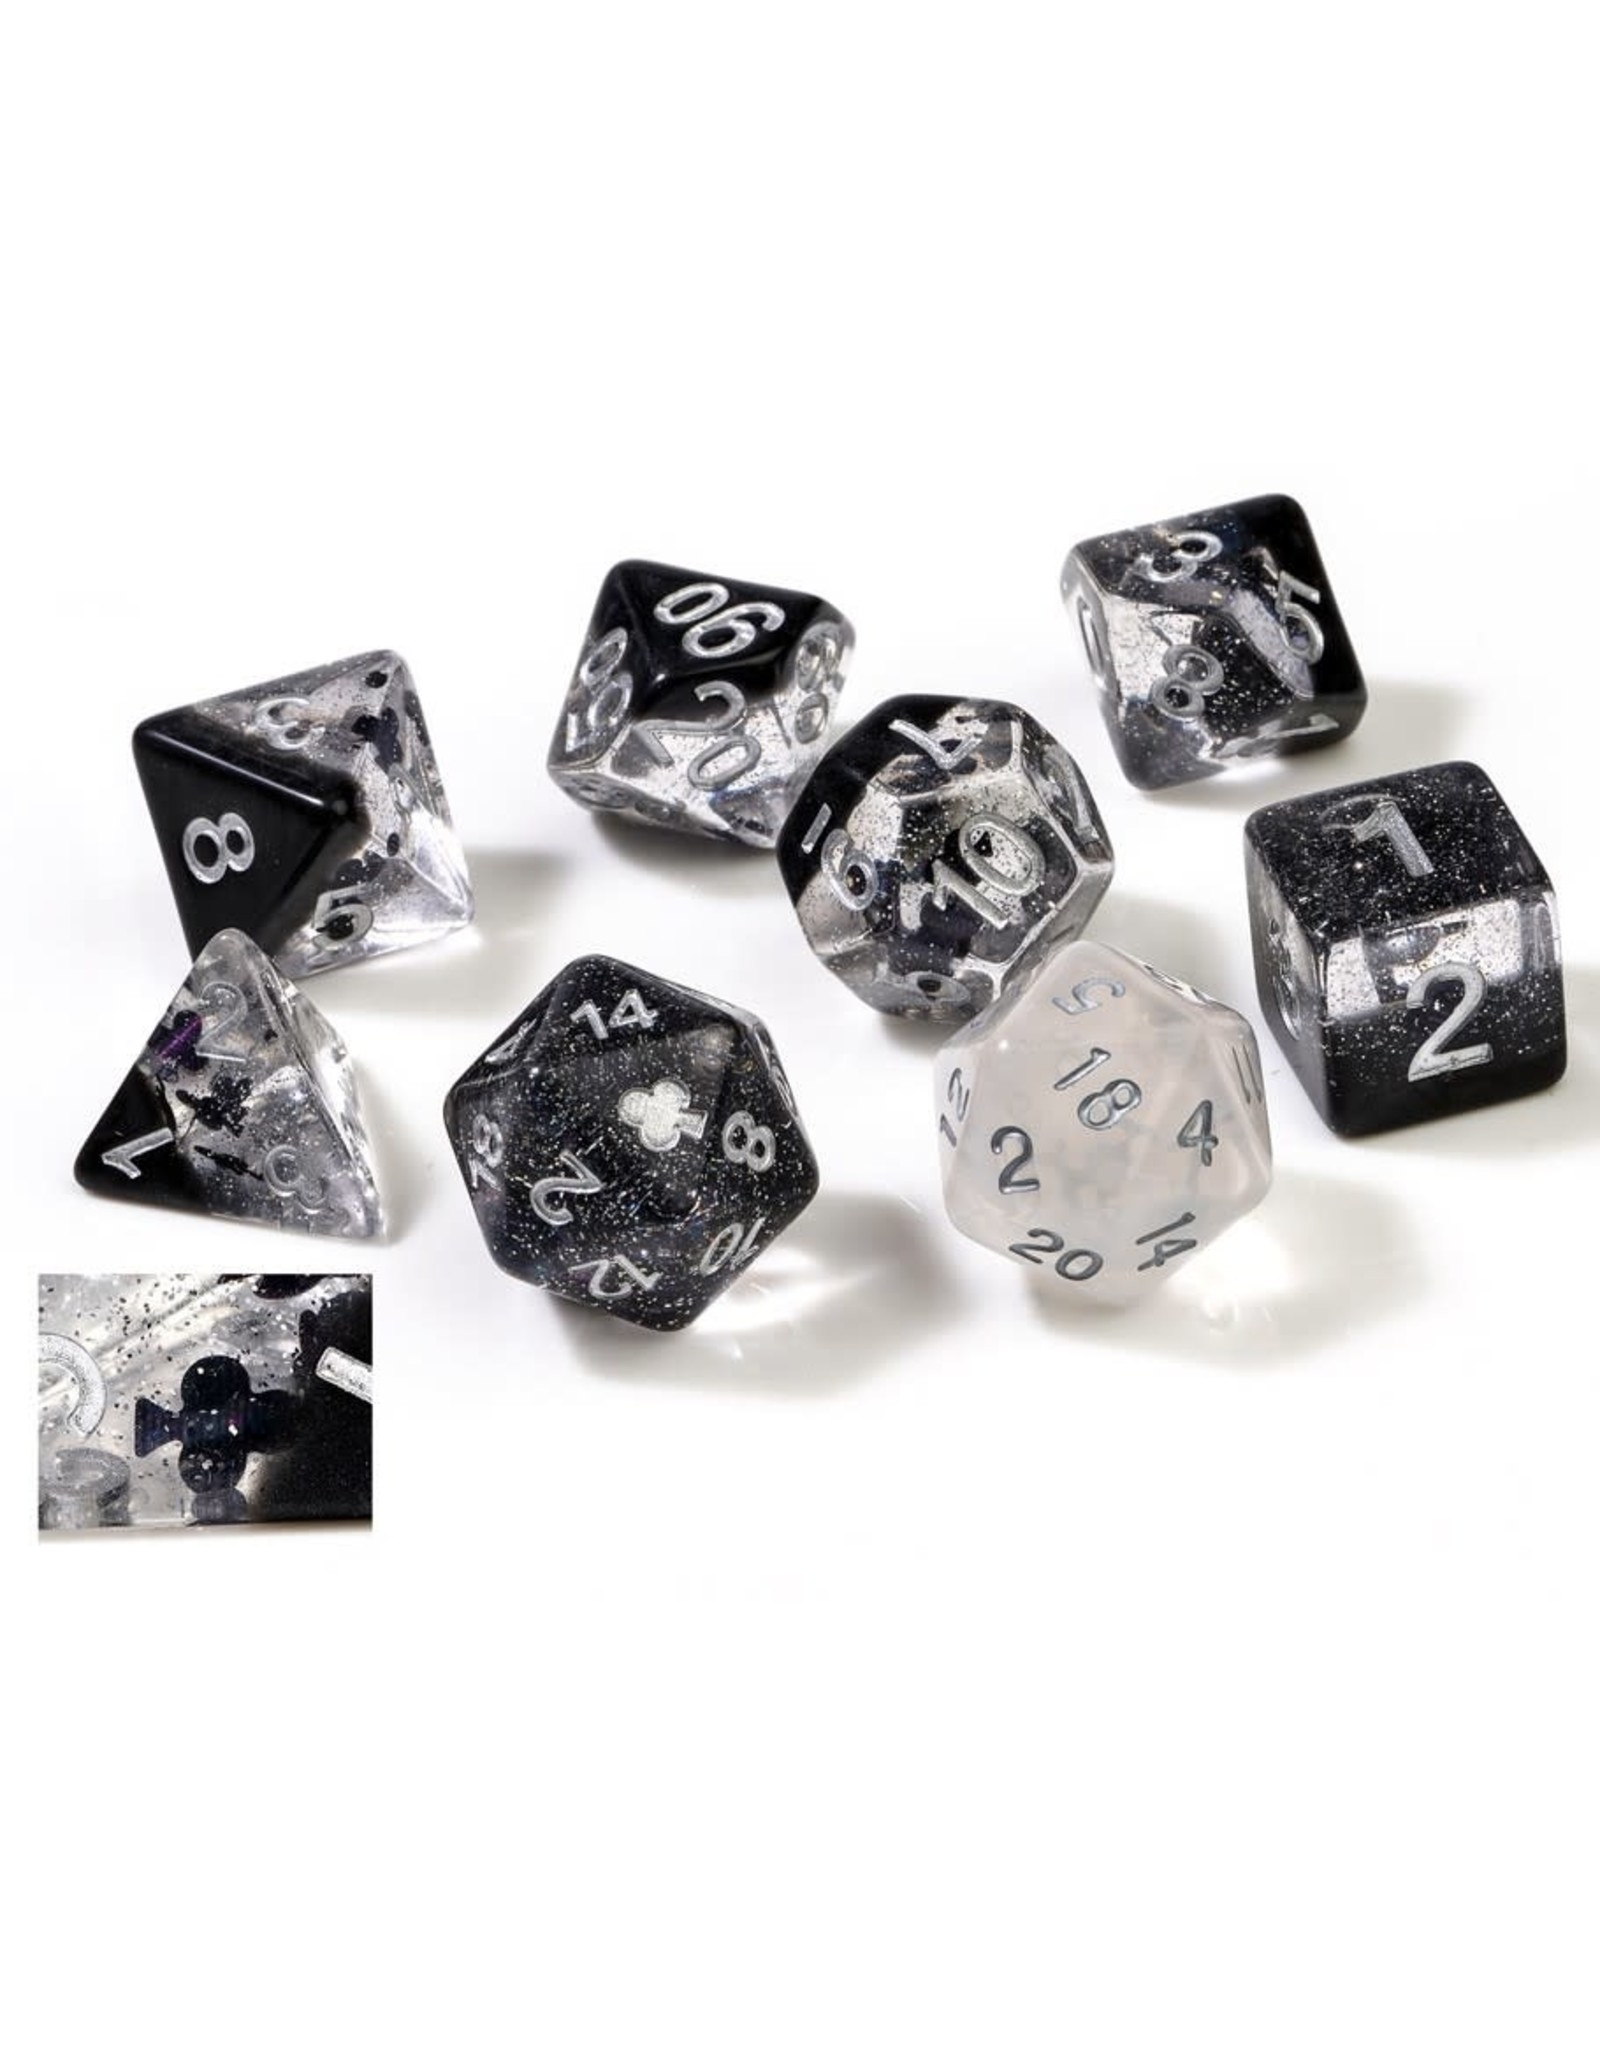 Sirius Dice RPG Dice Set: (7) Clubs